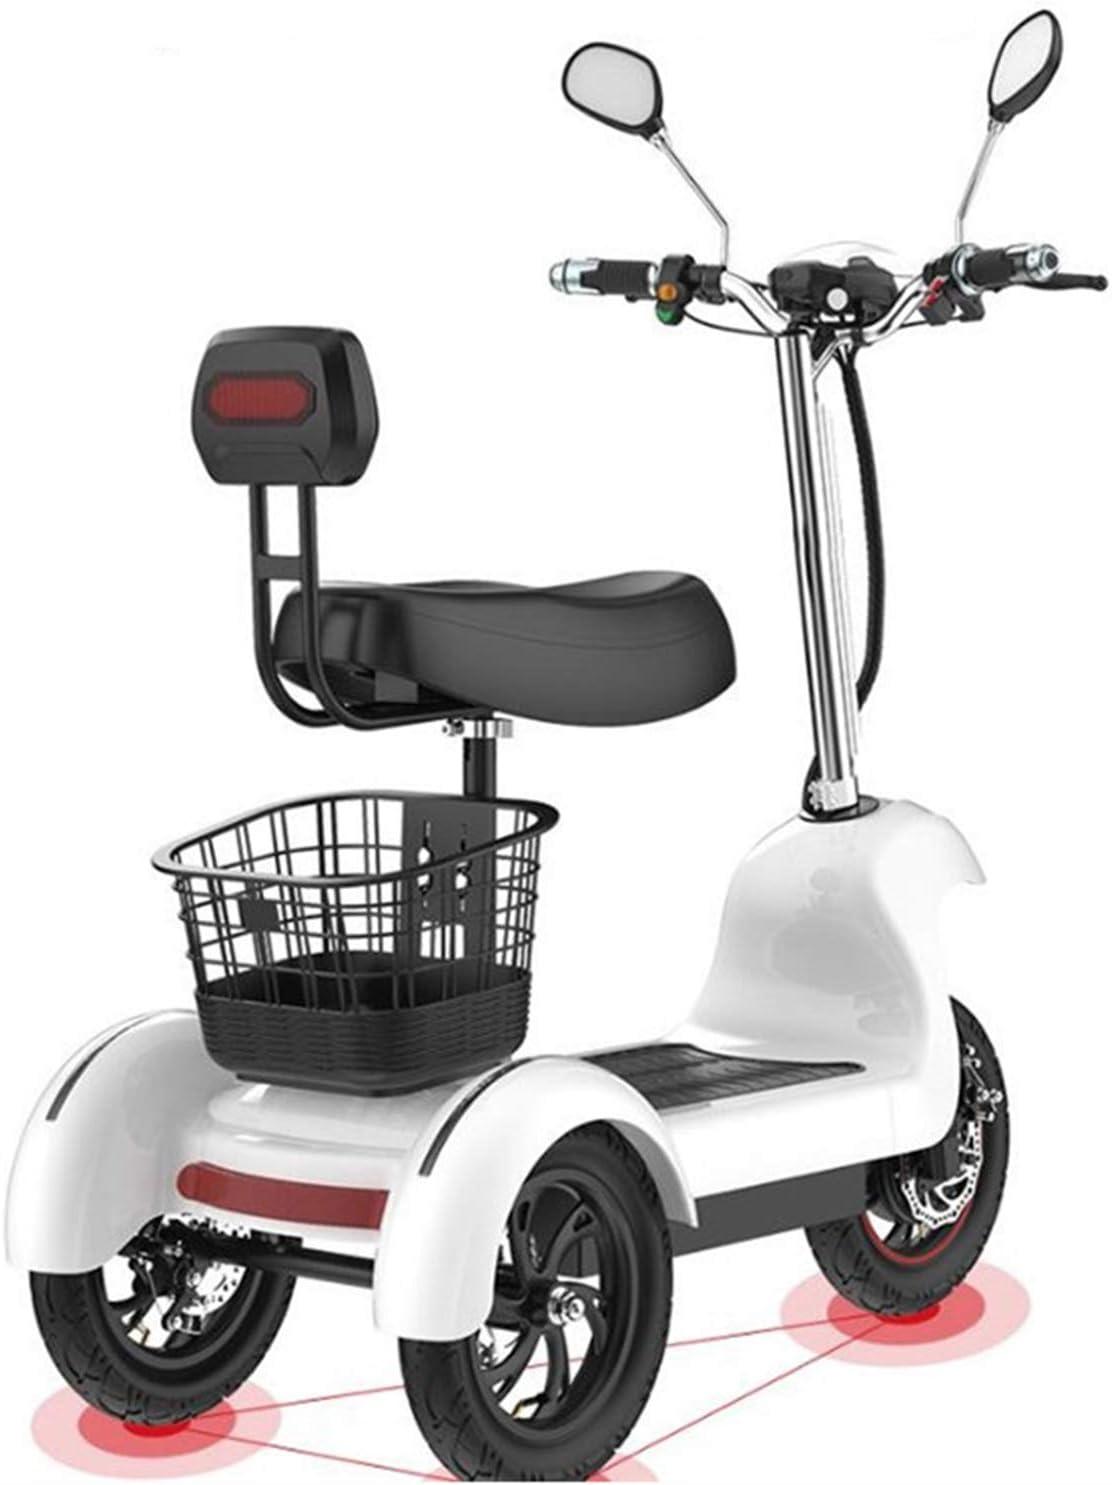 SZ-DDC Triciclo de Scooter eléctrico de Tres Ruedas Scooters eléctricos 12 Pulgadas 48V 500W portátiles Adultos Scooter eléctrico con Dos Asientos